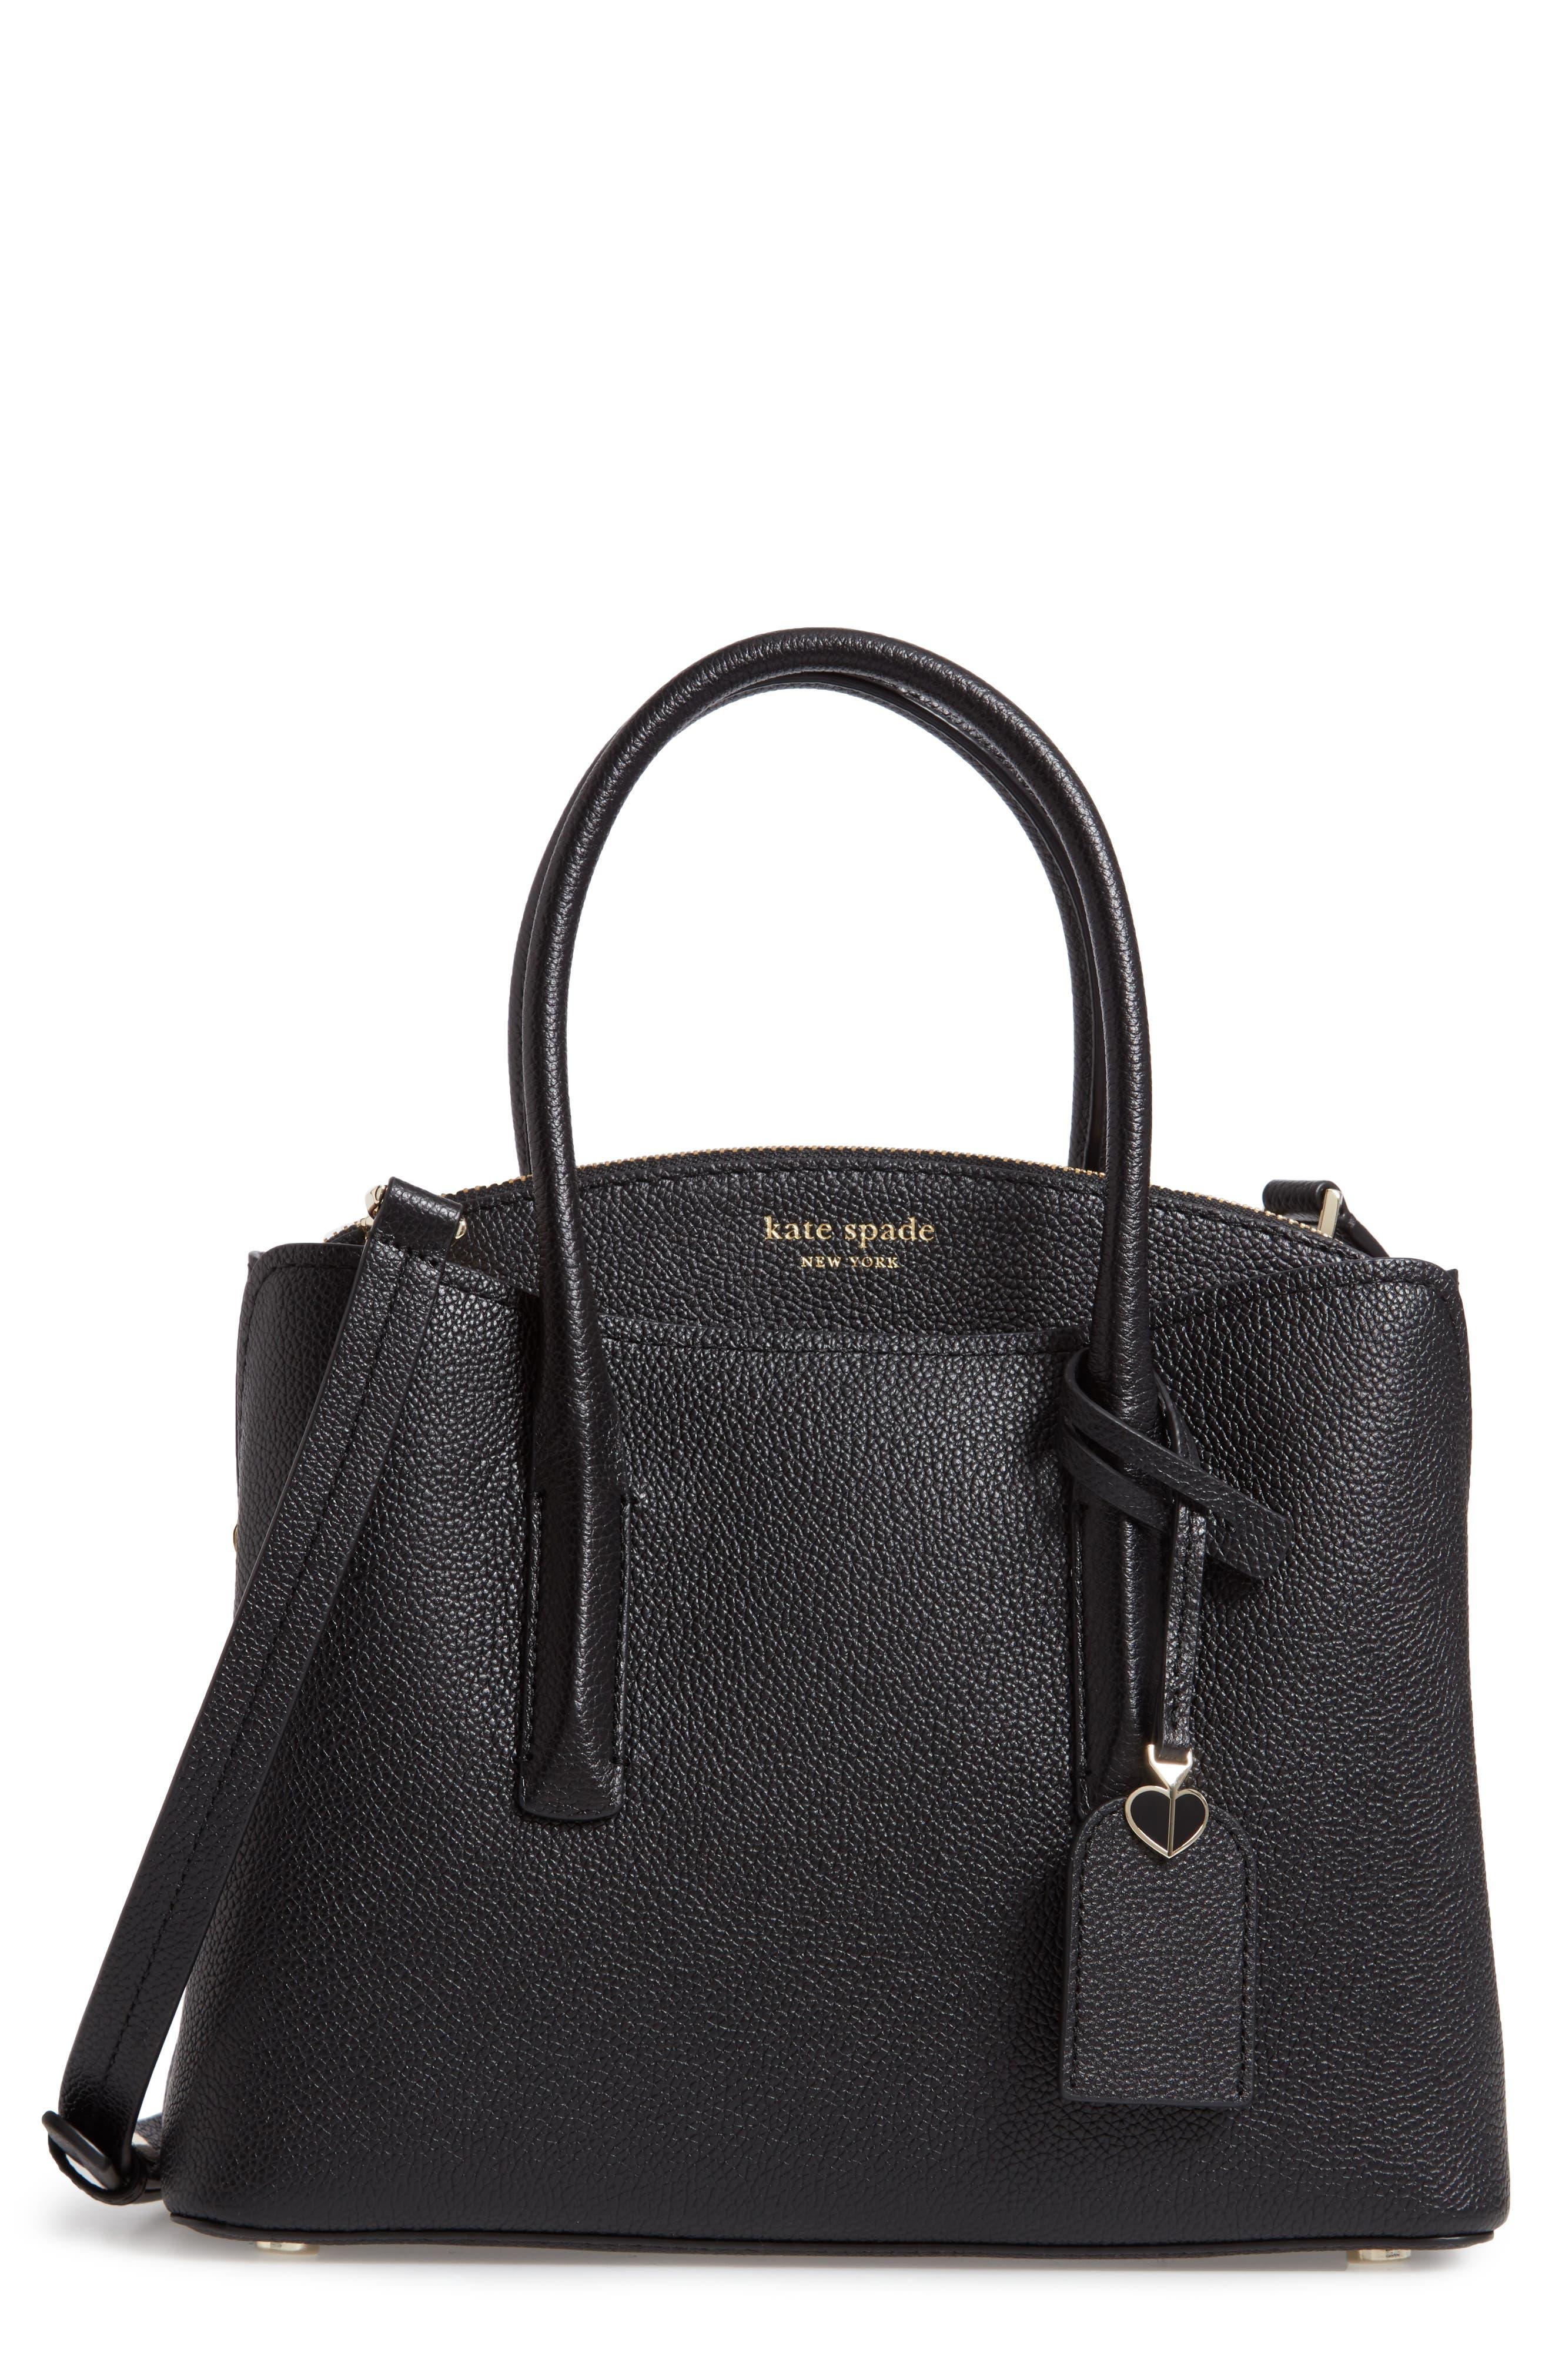 KATE SPADE NEW YORK medium margaux leather satchel, Main, color, BLACK